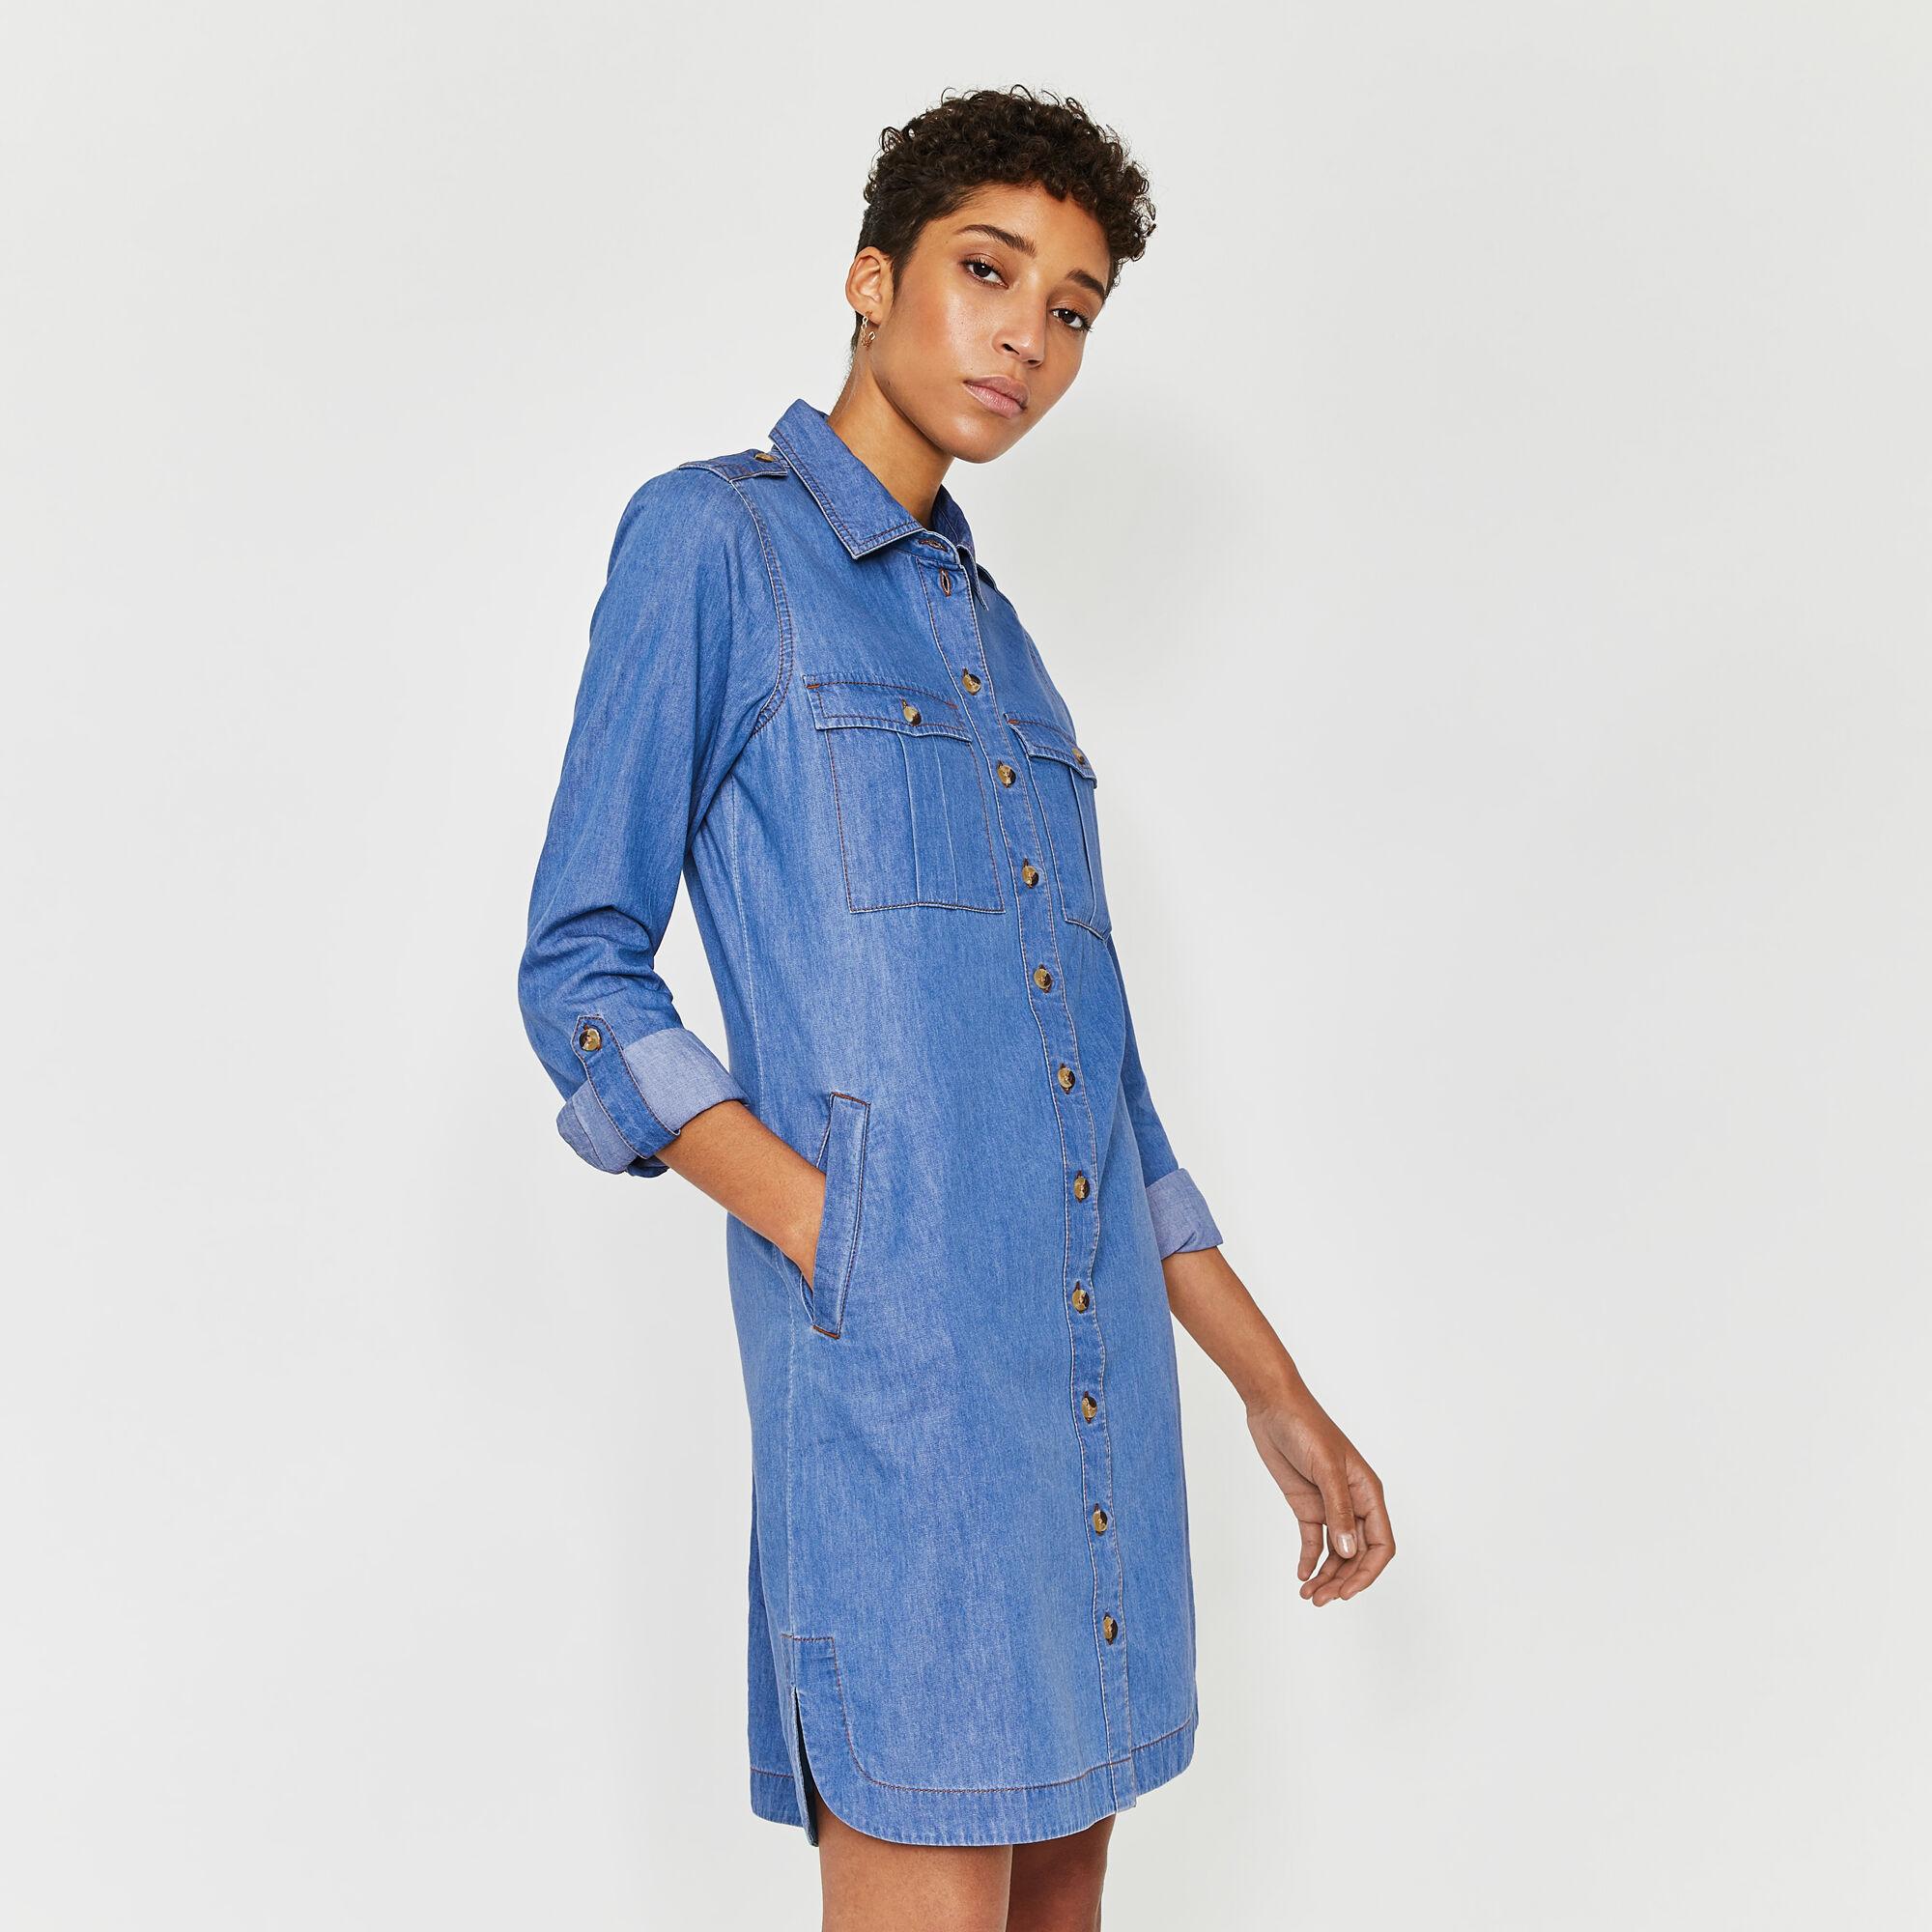 Warehouse, UTILITY DENIM MINI SHIRT DRESS Light Wash Denim 1